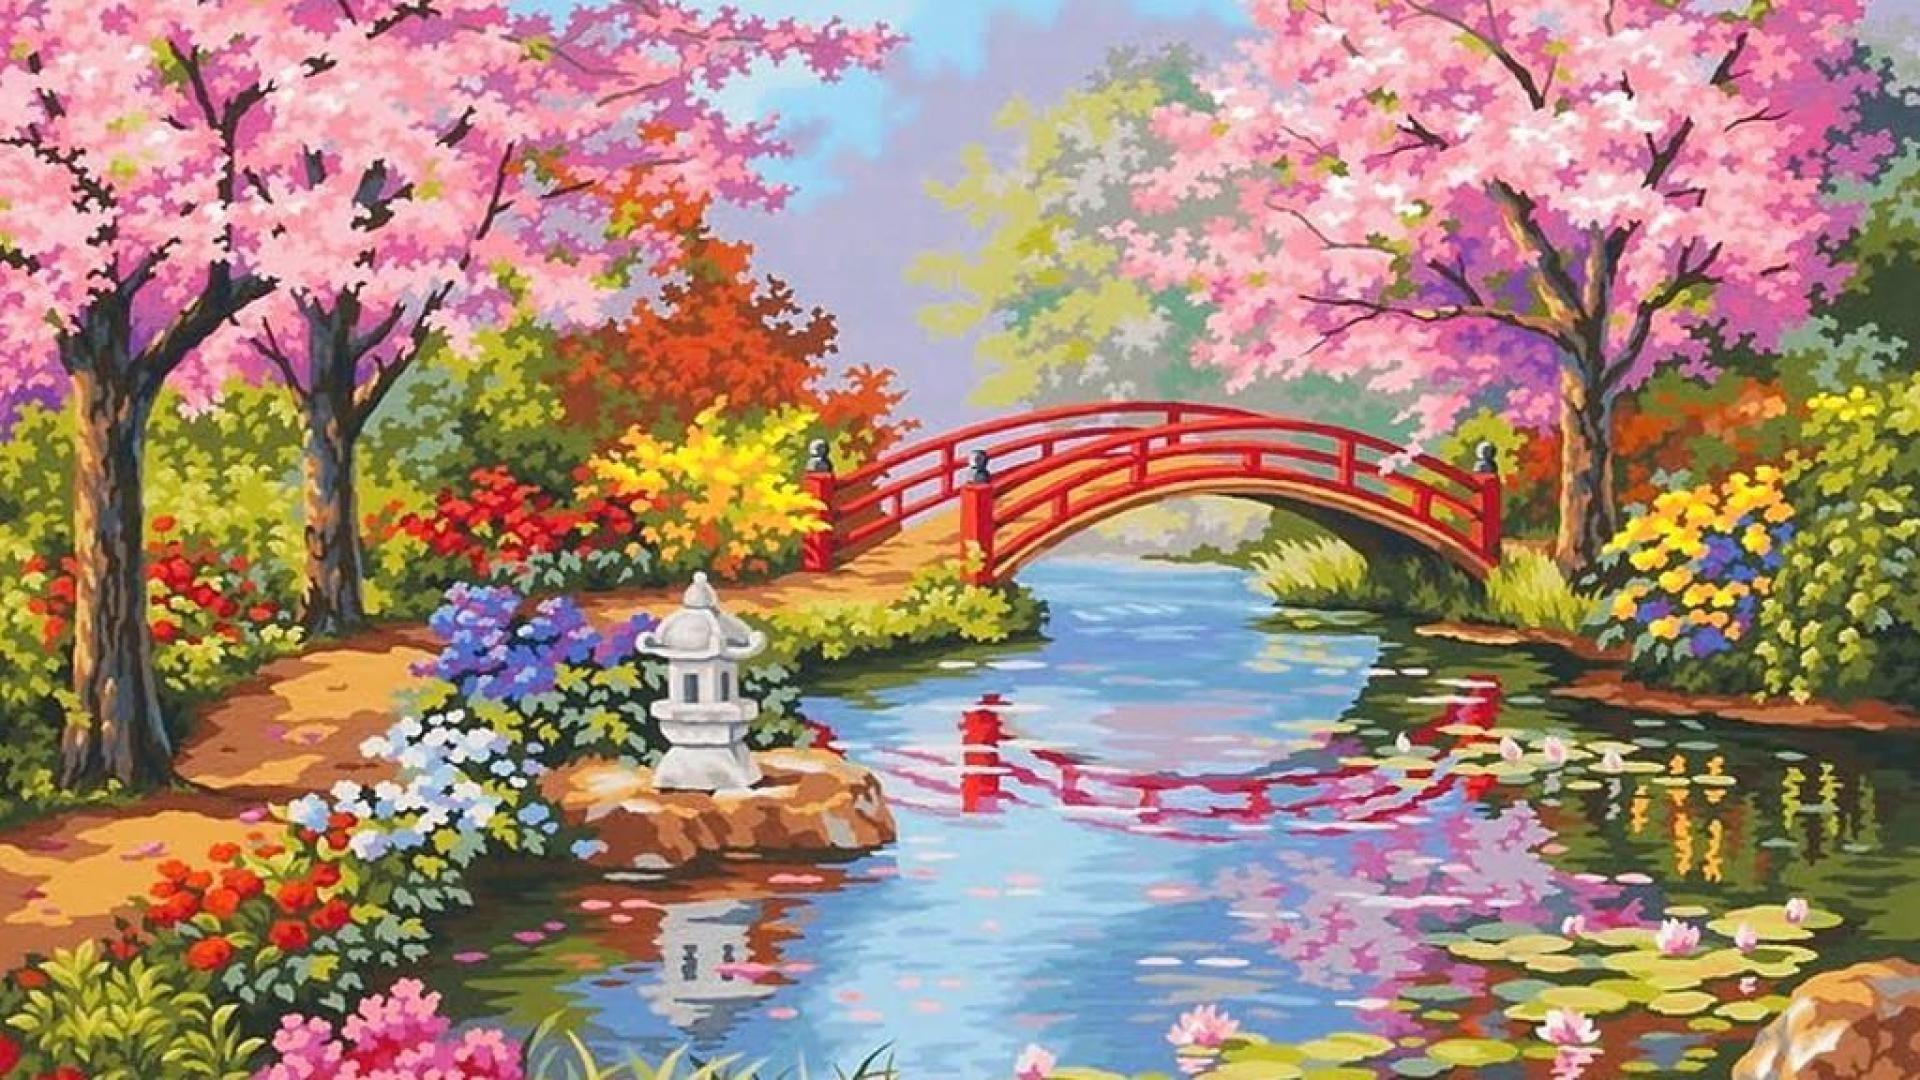 Beautiful Flower Garden Paintings Flower Garden Wallpapers